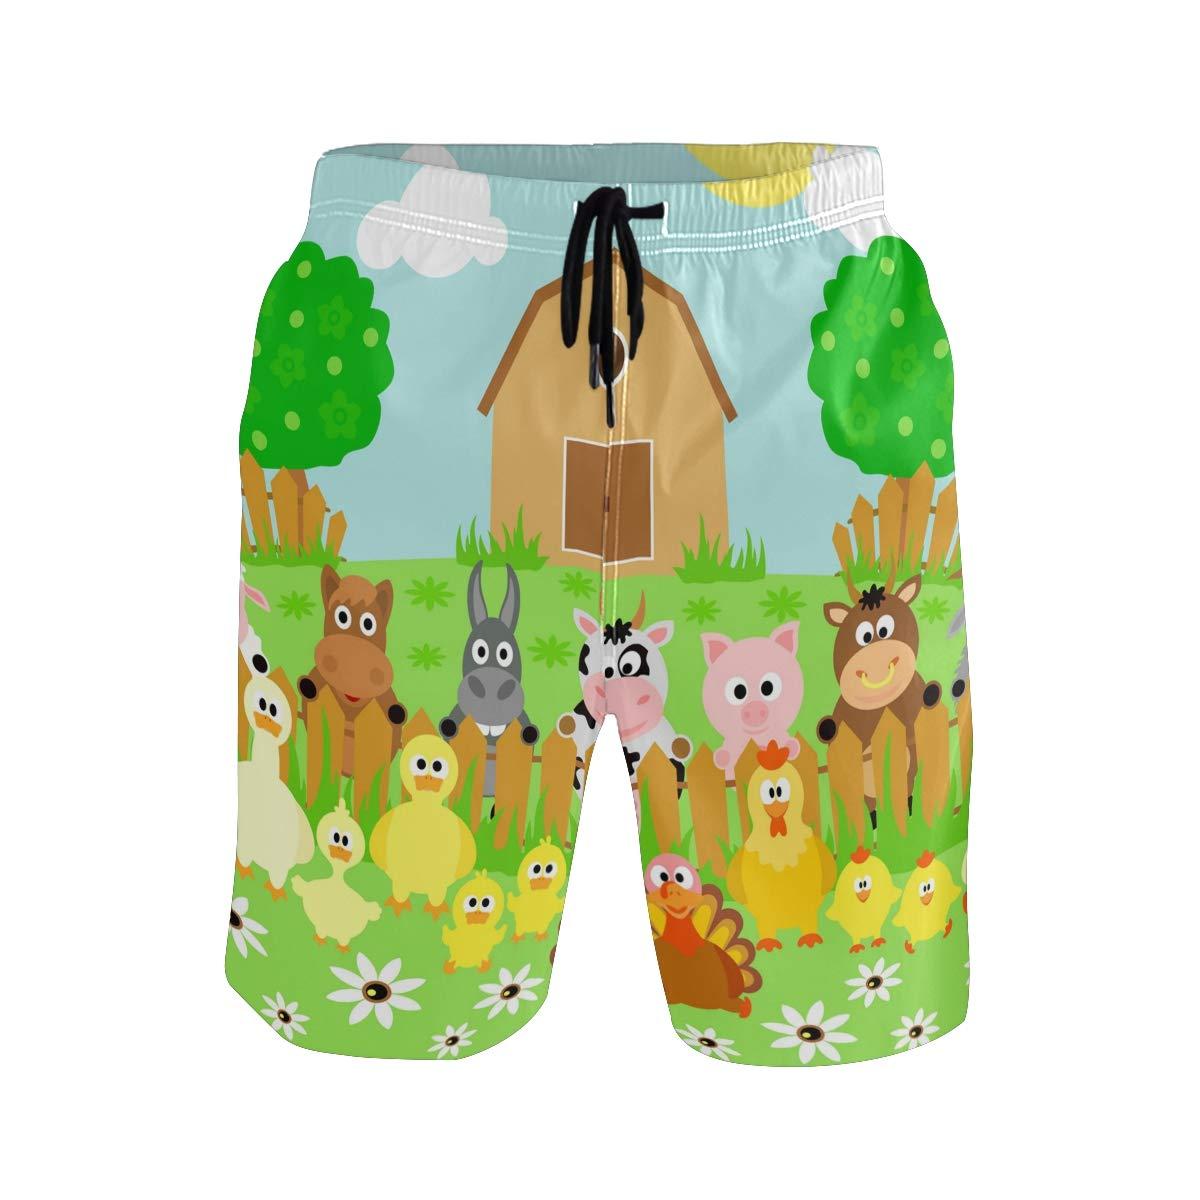 Mens Beach Swim Trunks Carton Farm Animals Fence Boxer Swimsuit Underwear Board Shorts with Pocket